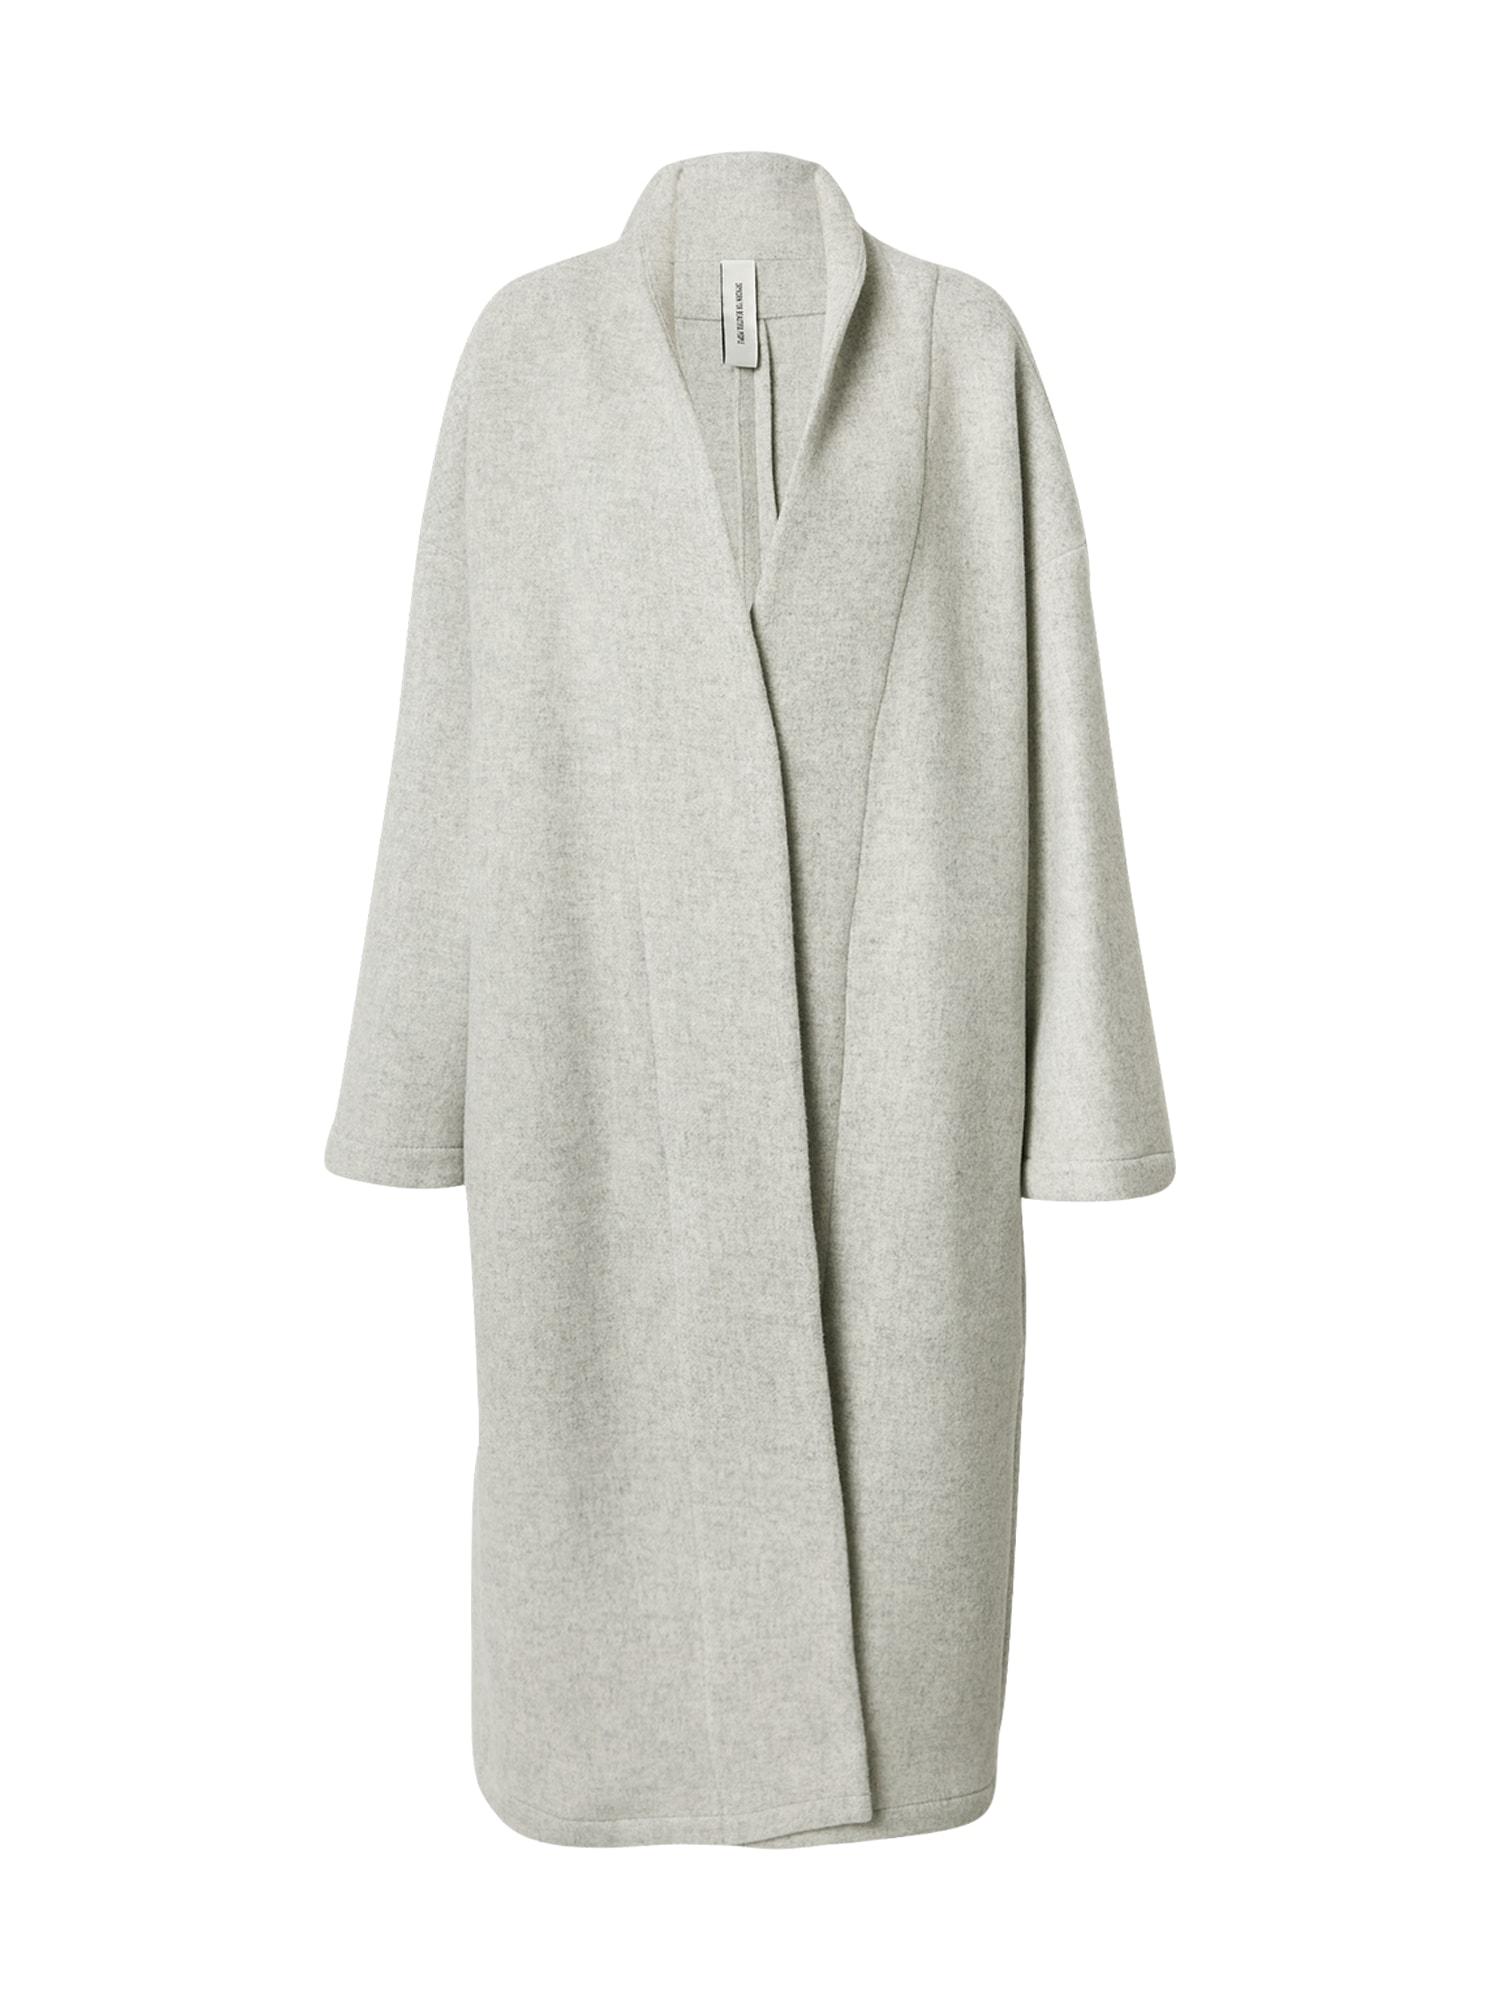 DRYKORN Rudeninis-žieminis paltas 'BANBURRY' pilka